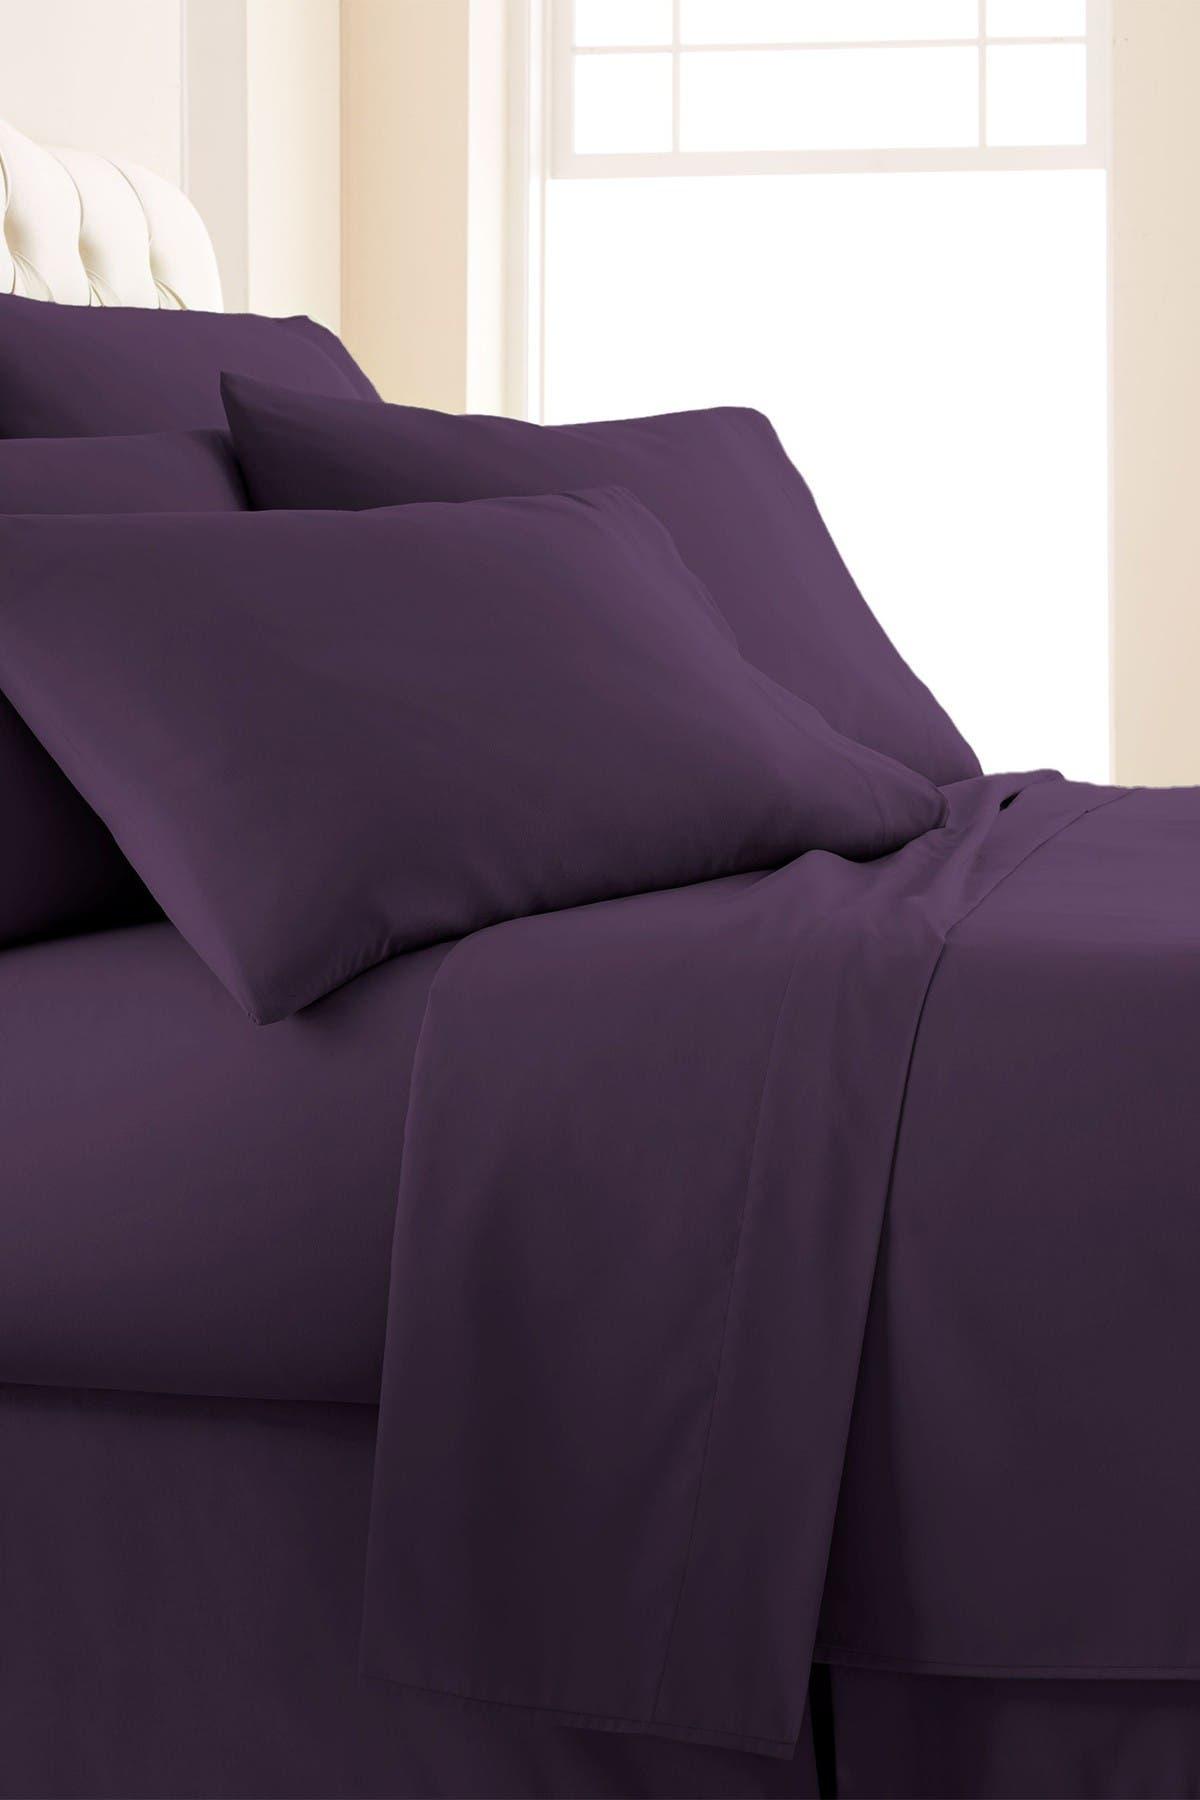 Image of SOUTHSHORE FINE LINENS California King Sized Vilano Springs Extra Deep Pocket Sheet Set - Purple